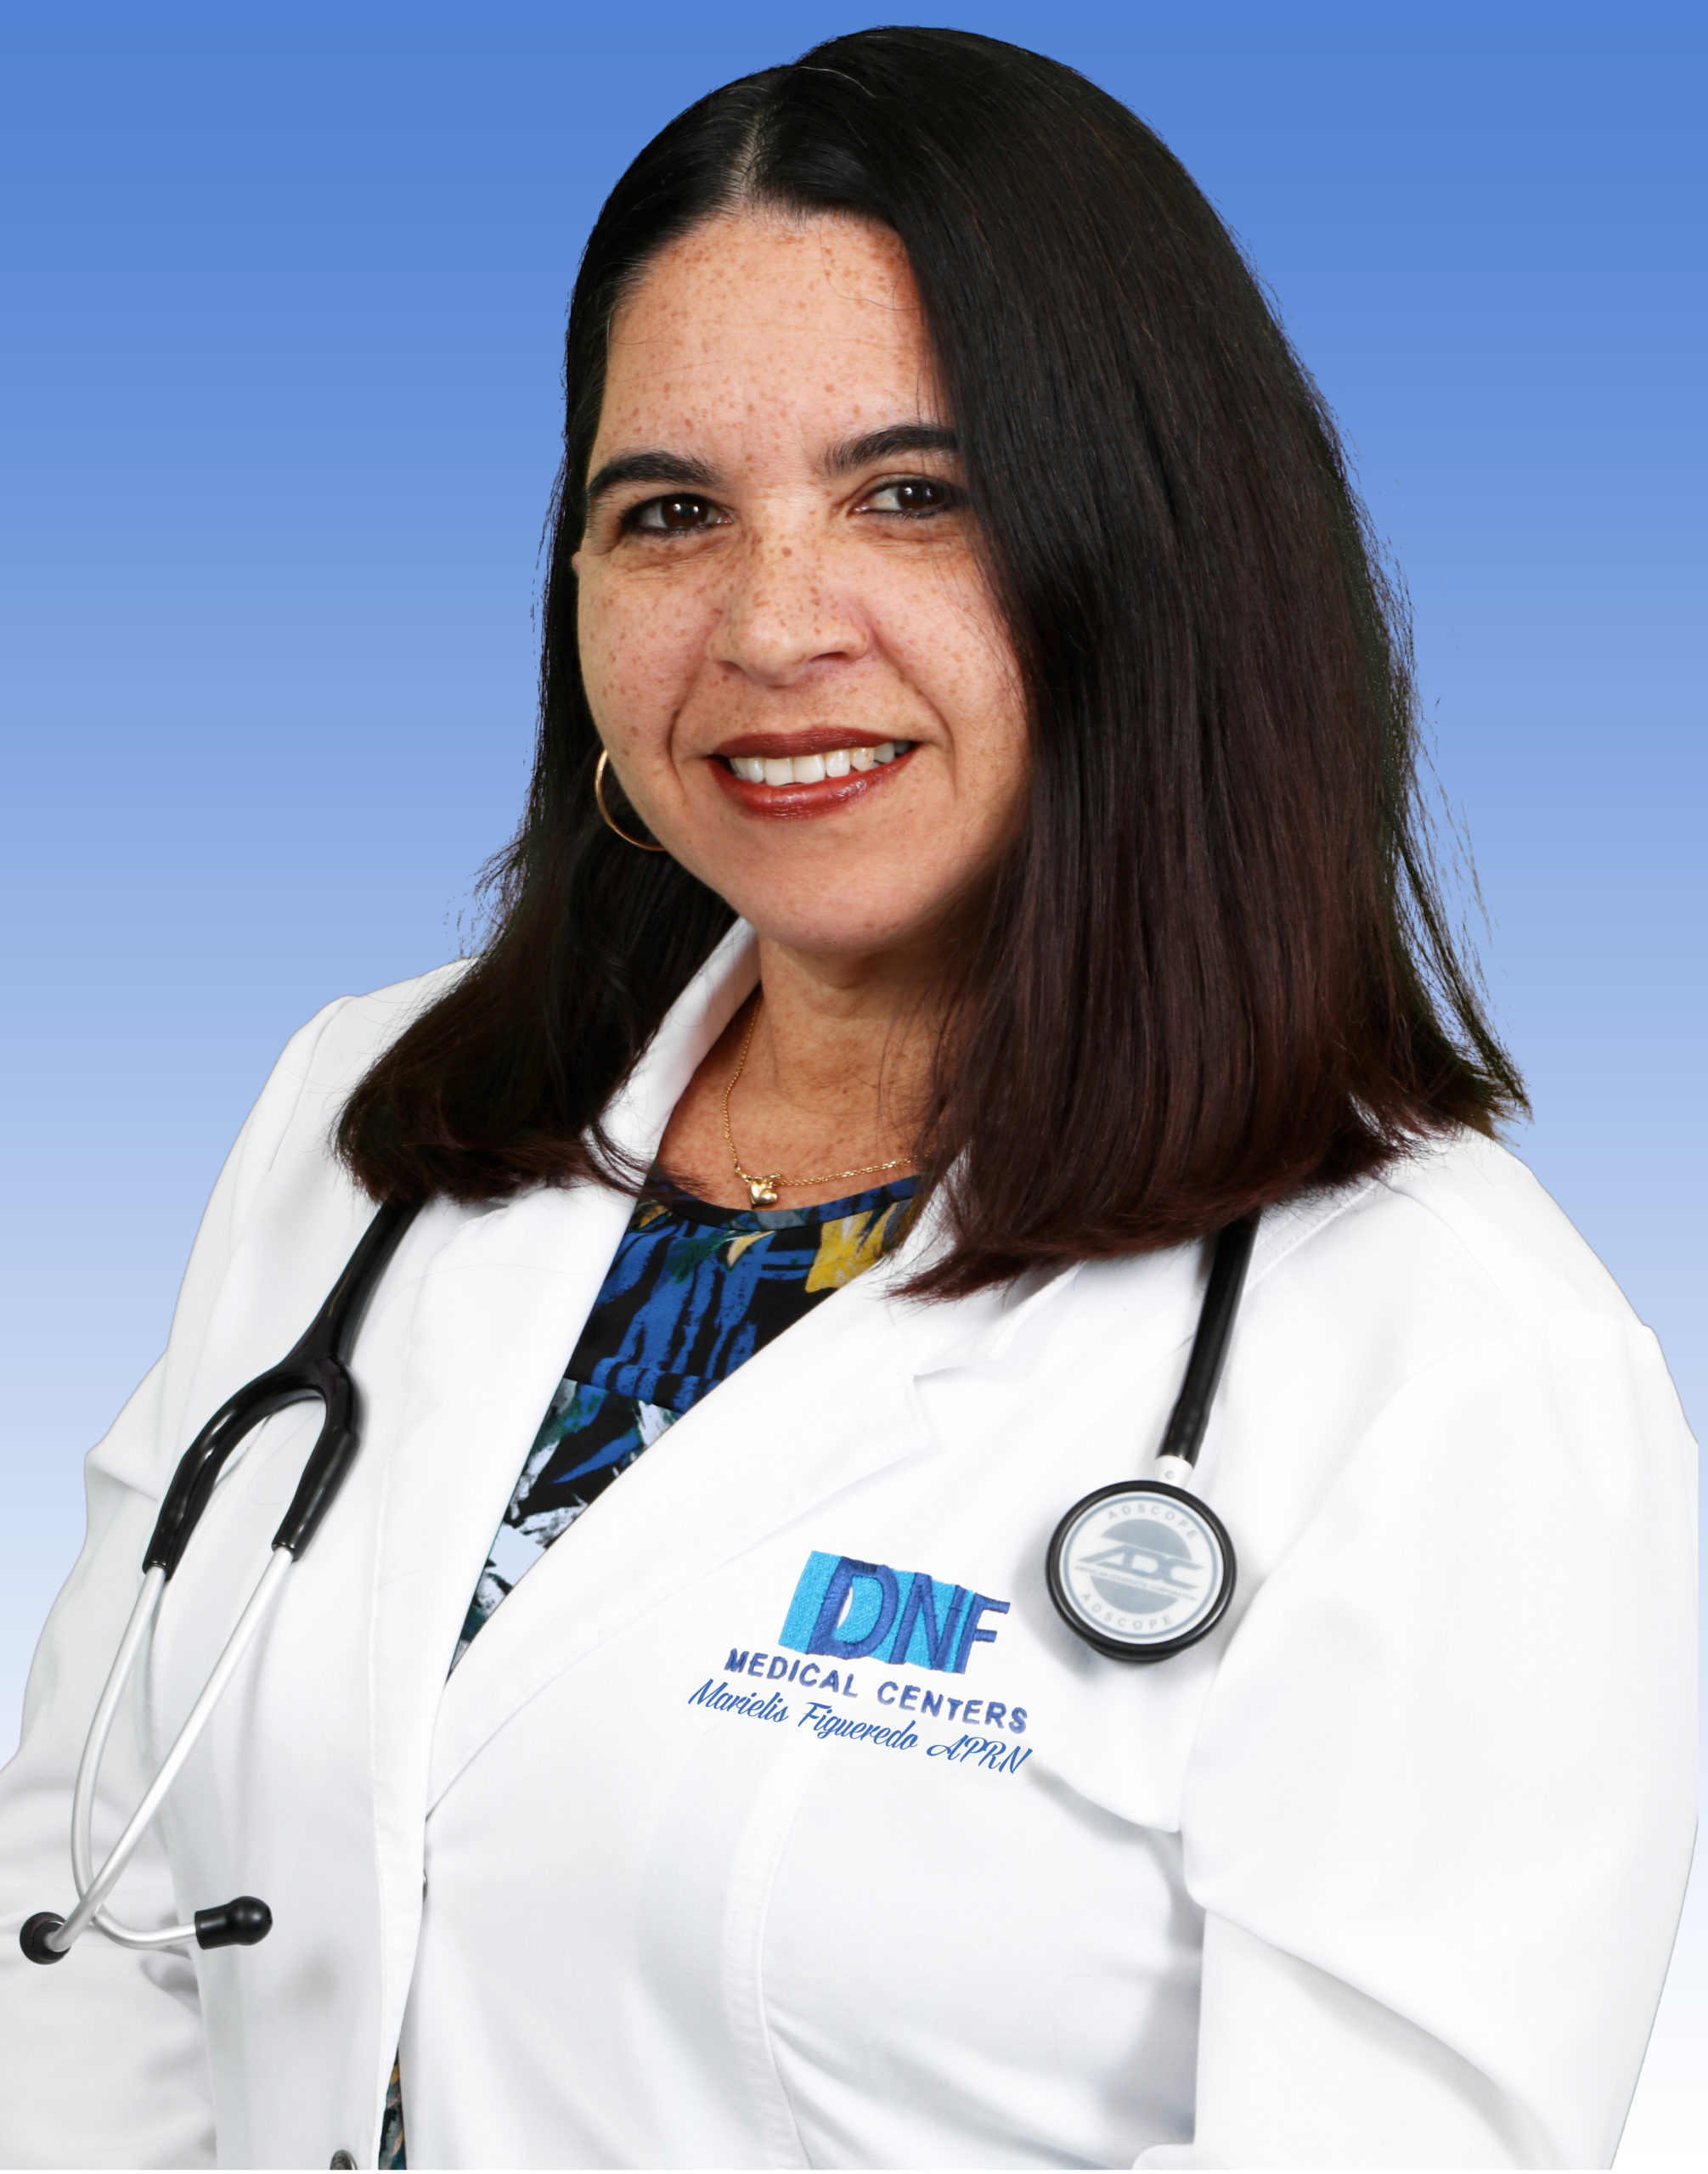 Mairelis Figueredo, APRN